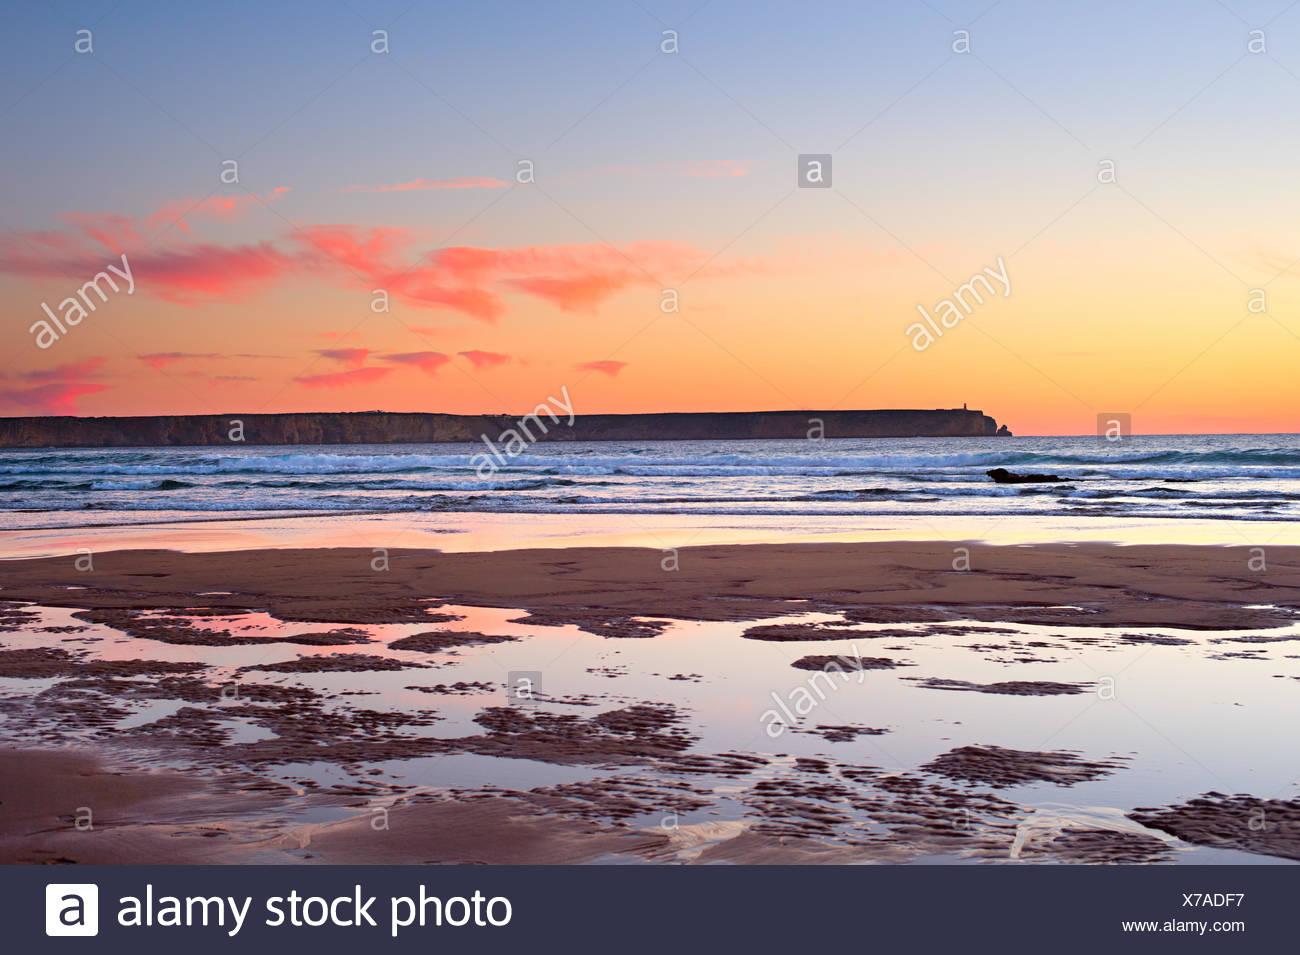 Varicolored ocean sunset, Portugal - Stock Image